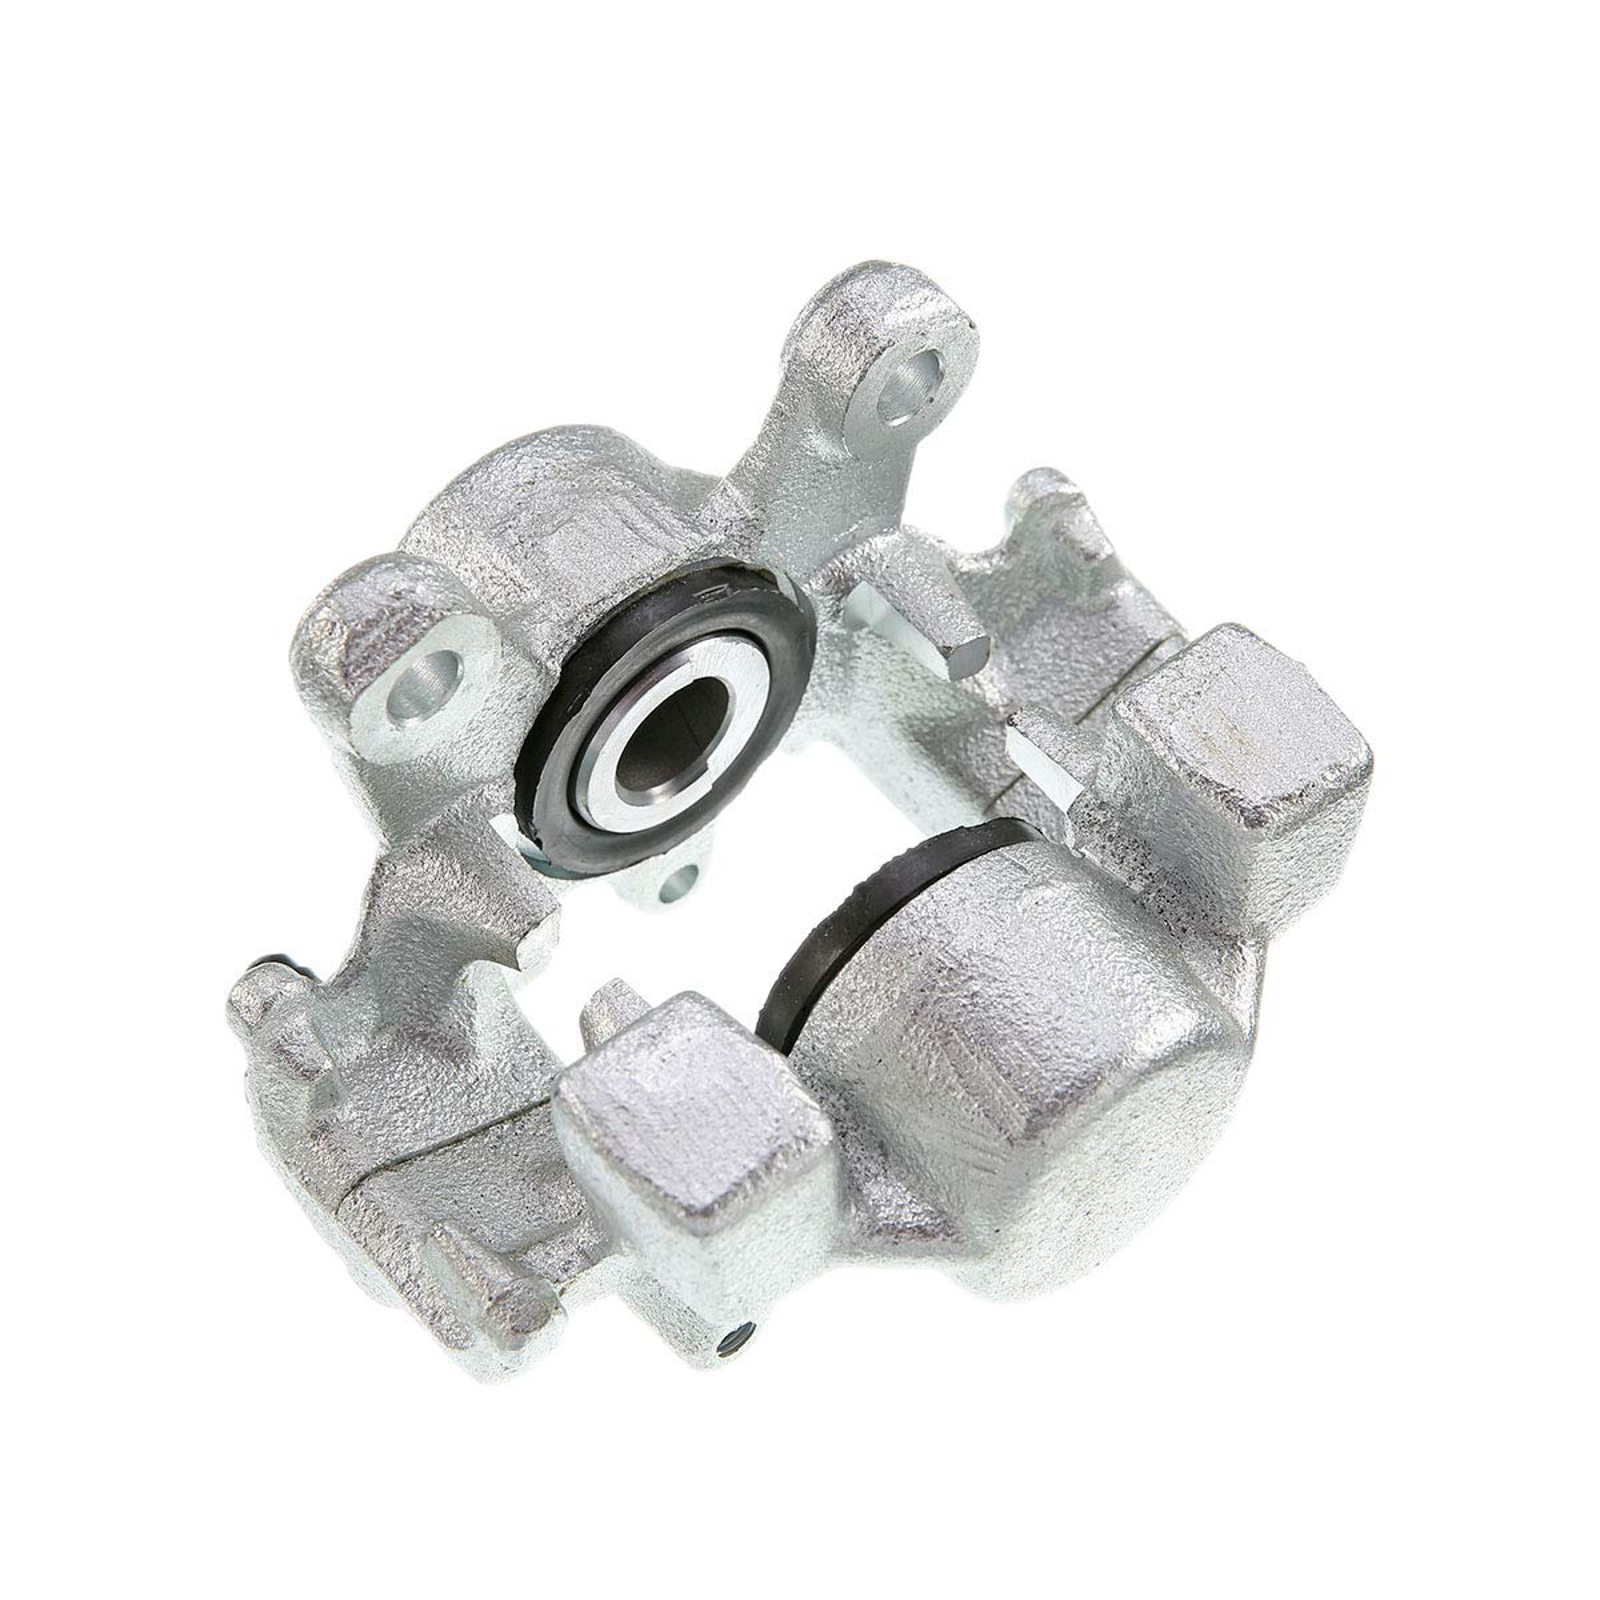 Ankerblech Schutzblech Bremse Deckblech HR für MERCEDES C-KLASSE W203 CL203 S203